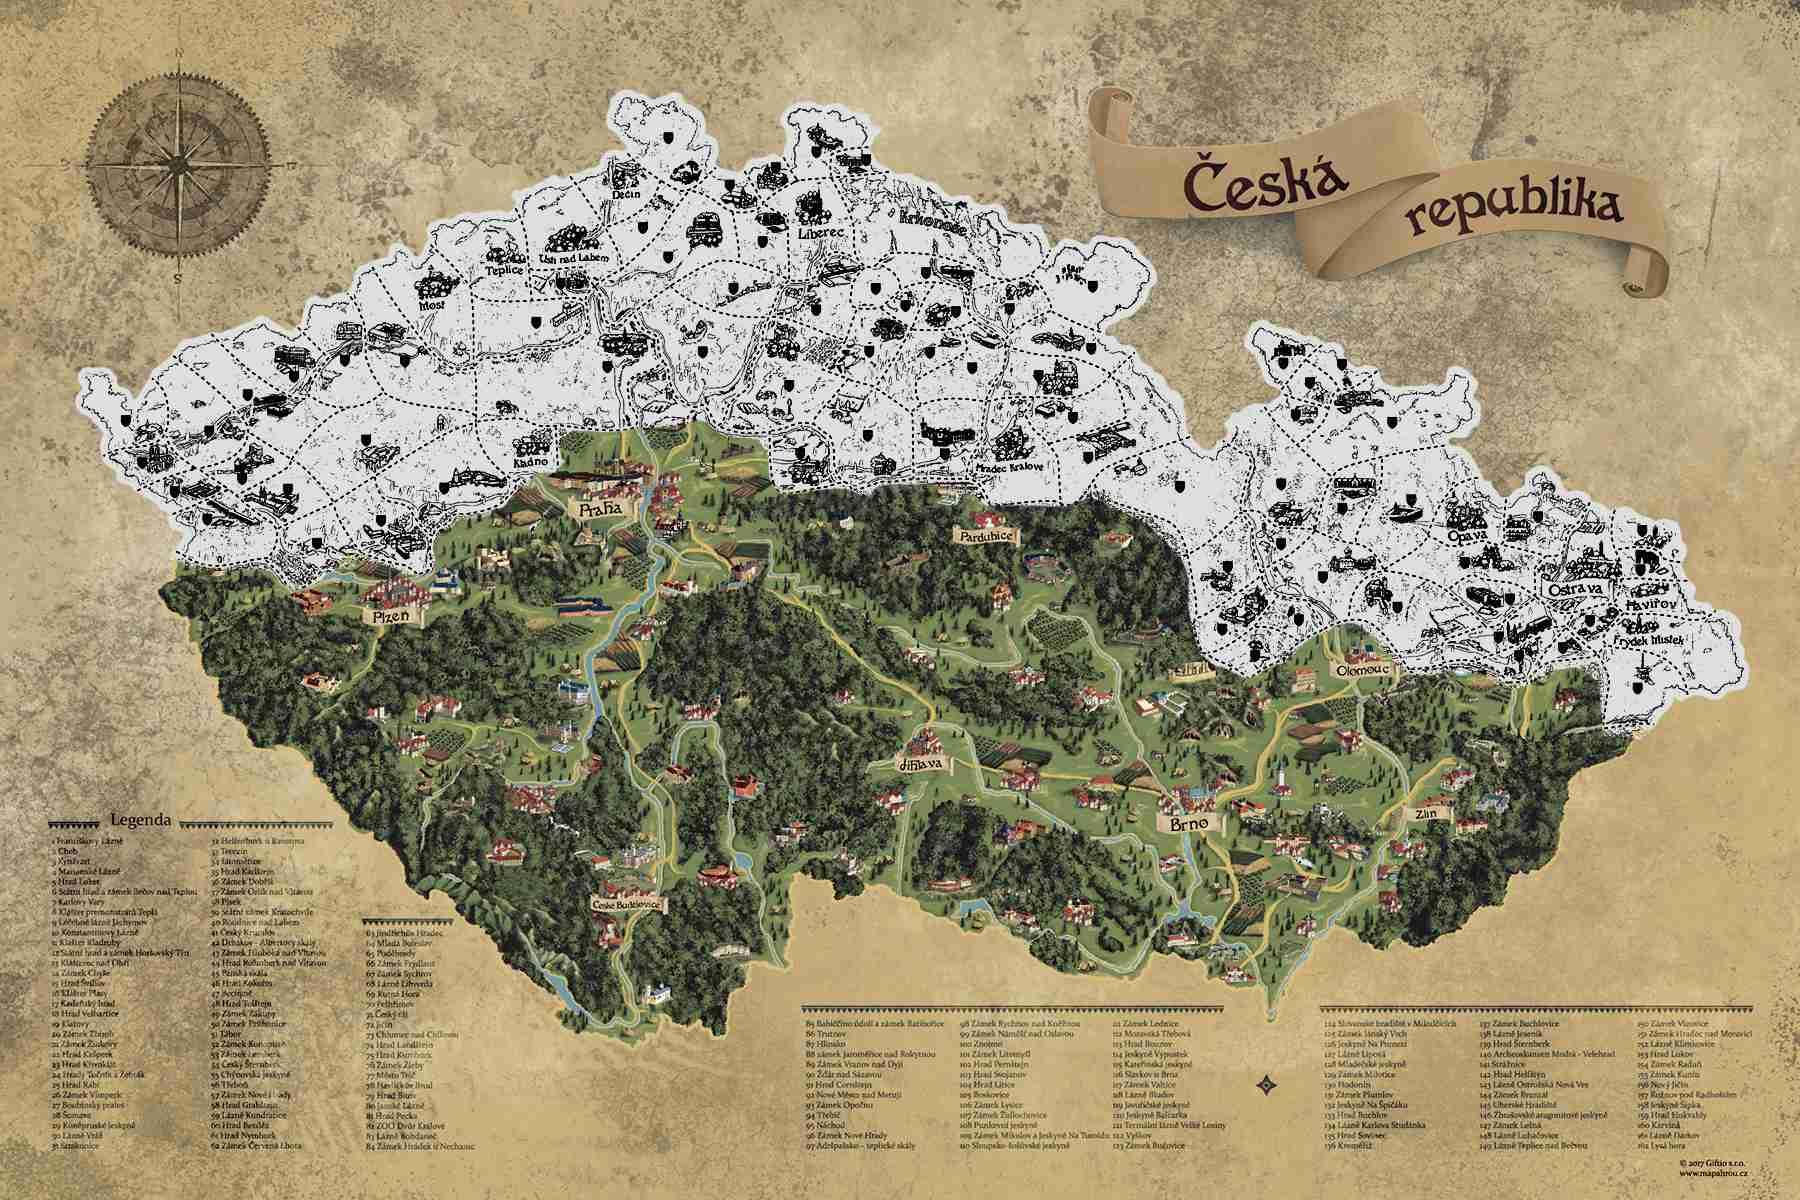 Stírací mapa Česka Deluxe XL, Stříbrná